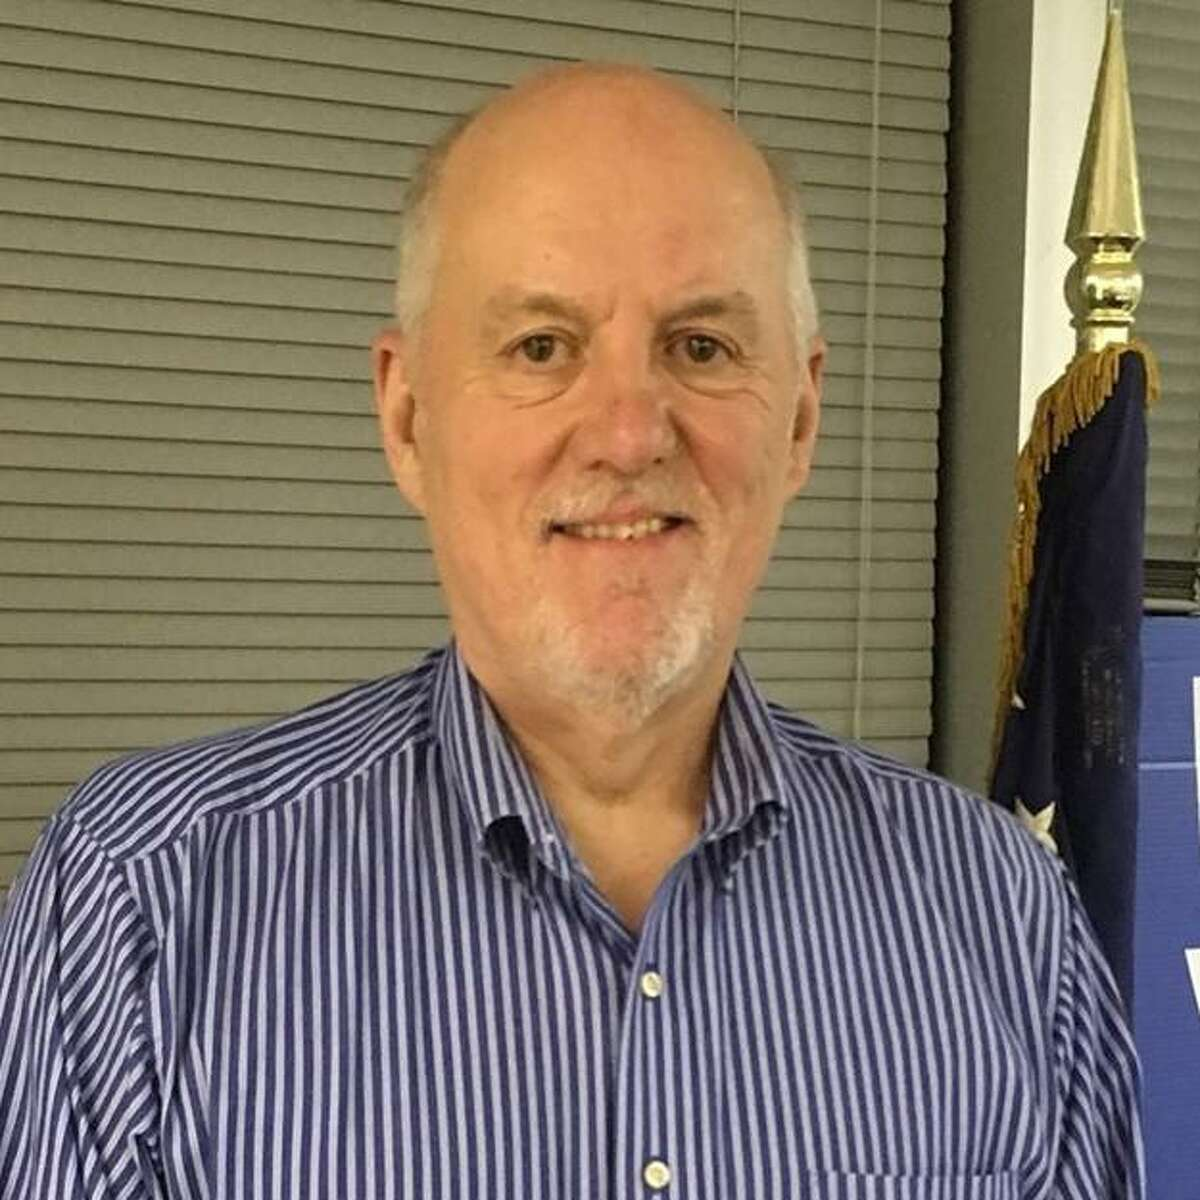 Stamford Board of Representatives member Jeff Curtis.